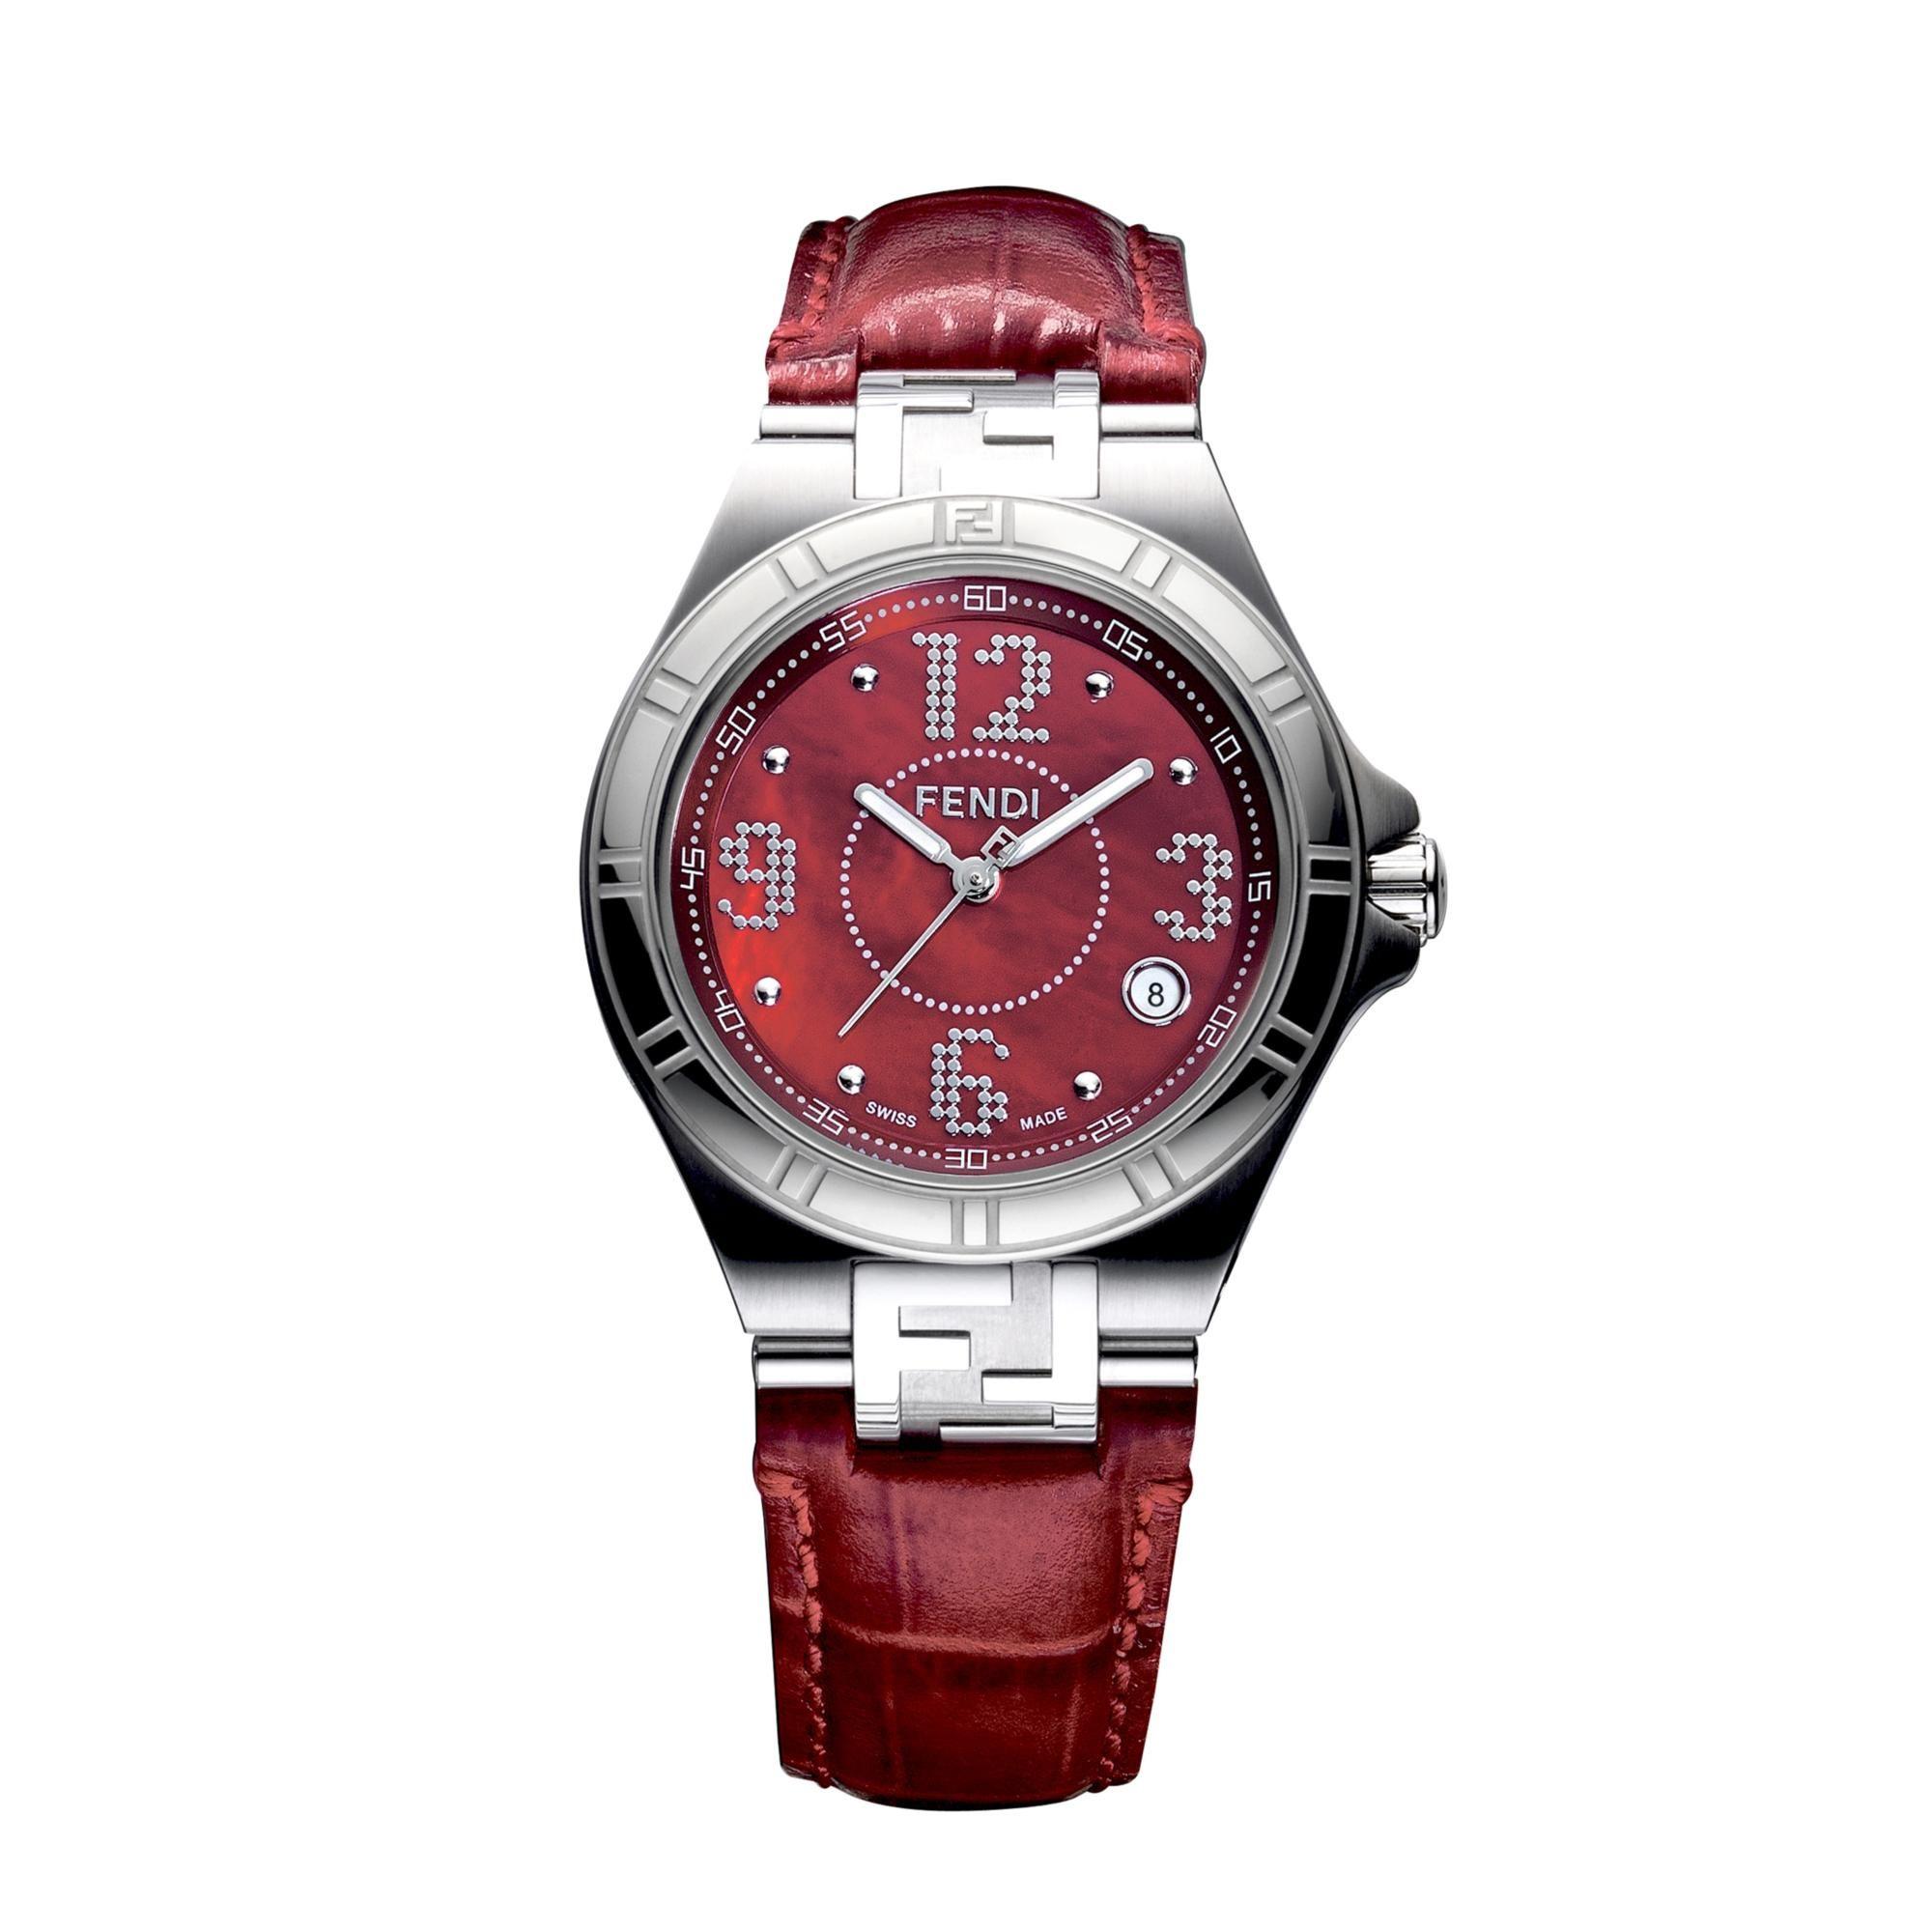 Fendi High Speed Analog Watch Steel Case Red MOP Dial Red Strap - F414377B